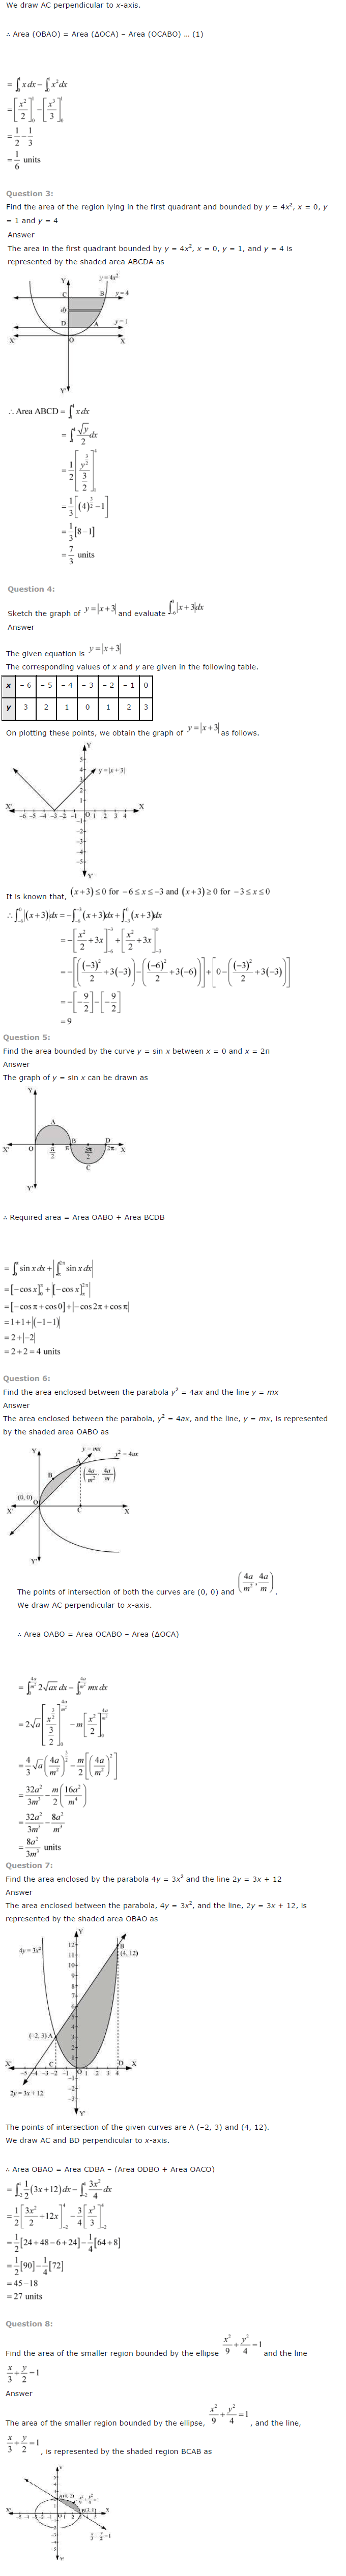 NCERT Solutions for Class 12 Maths Chapter 8 Application of Integrals ex 8.5